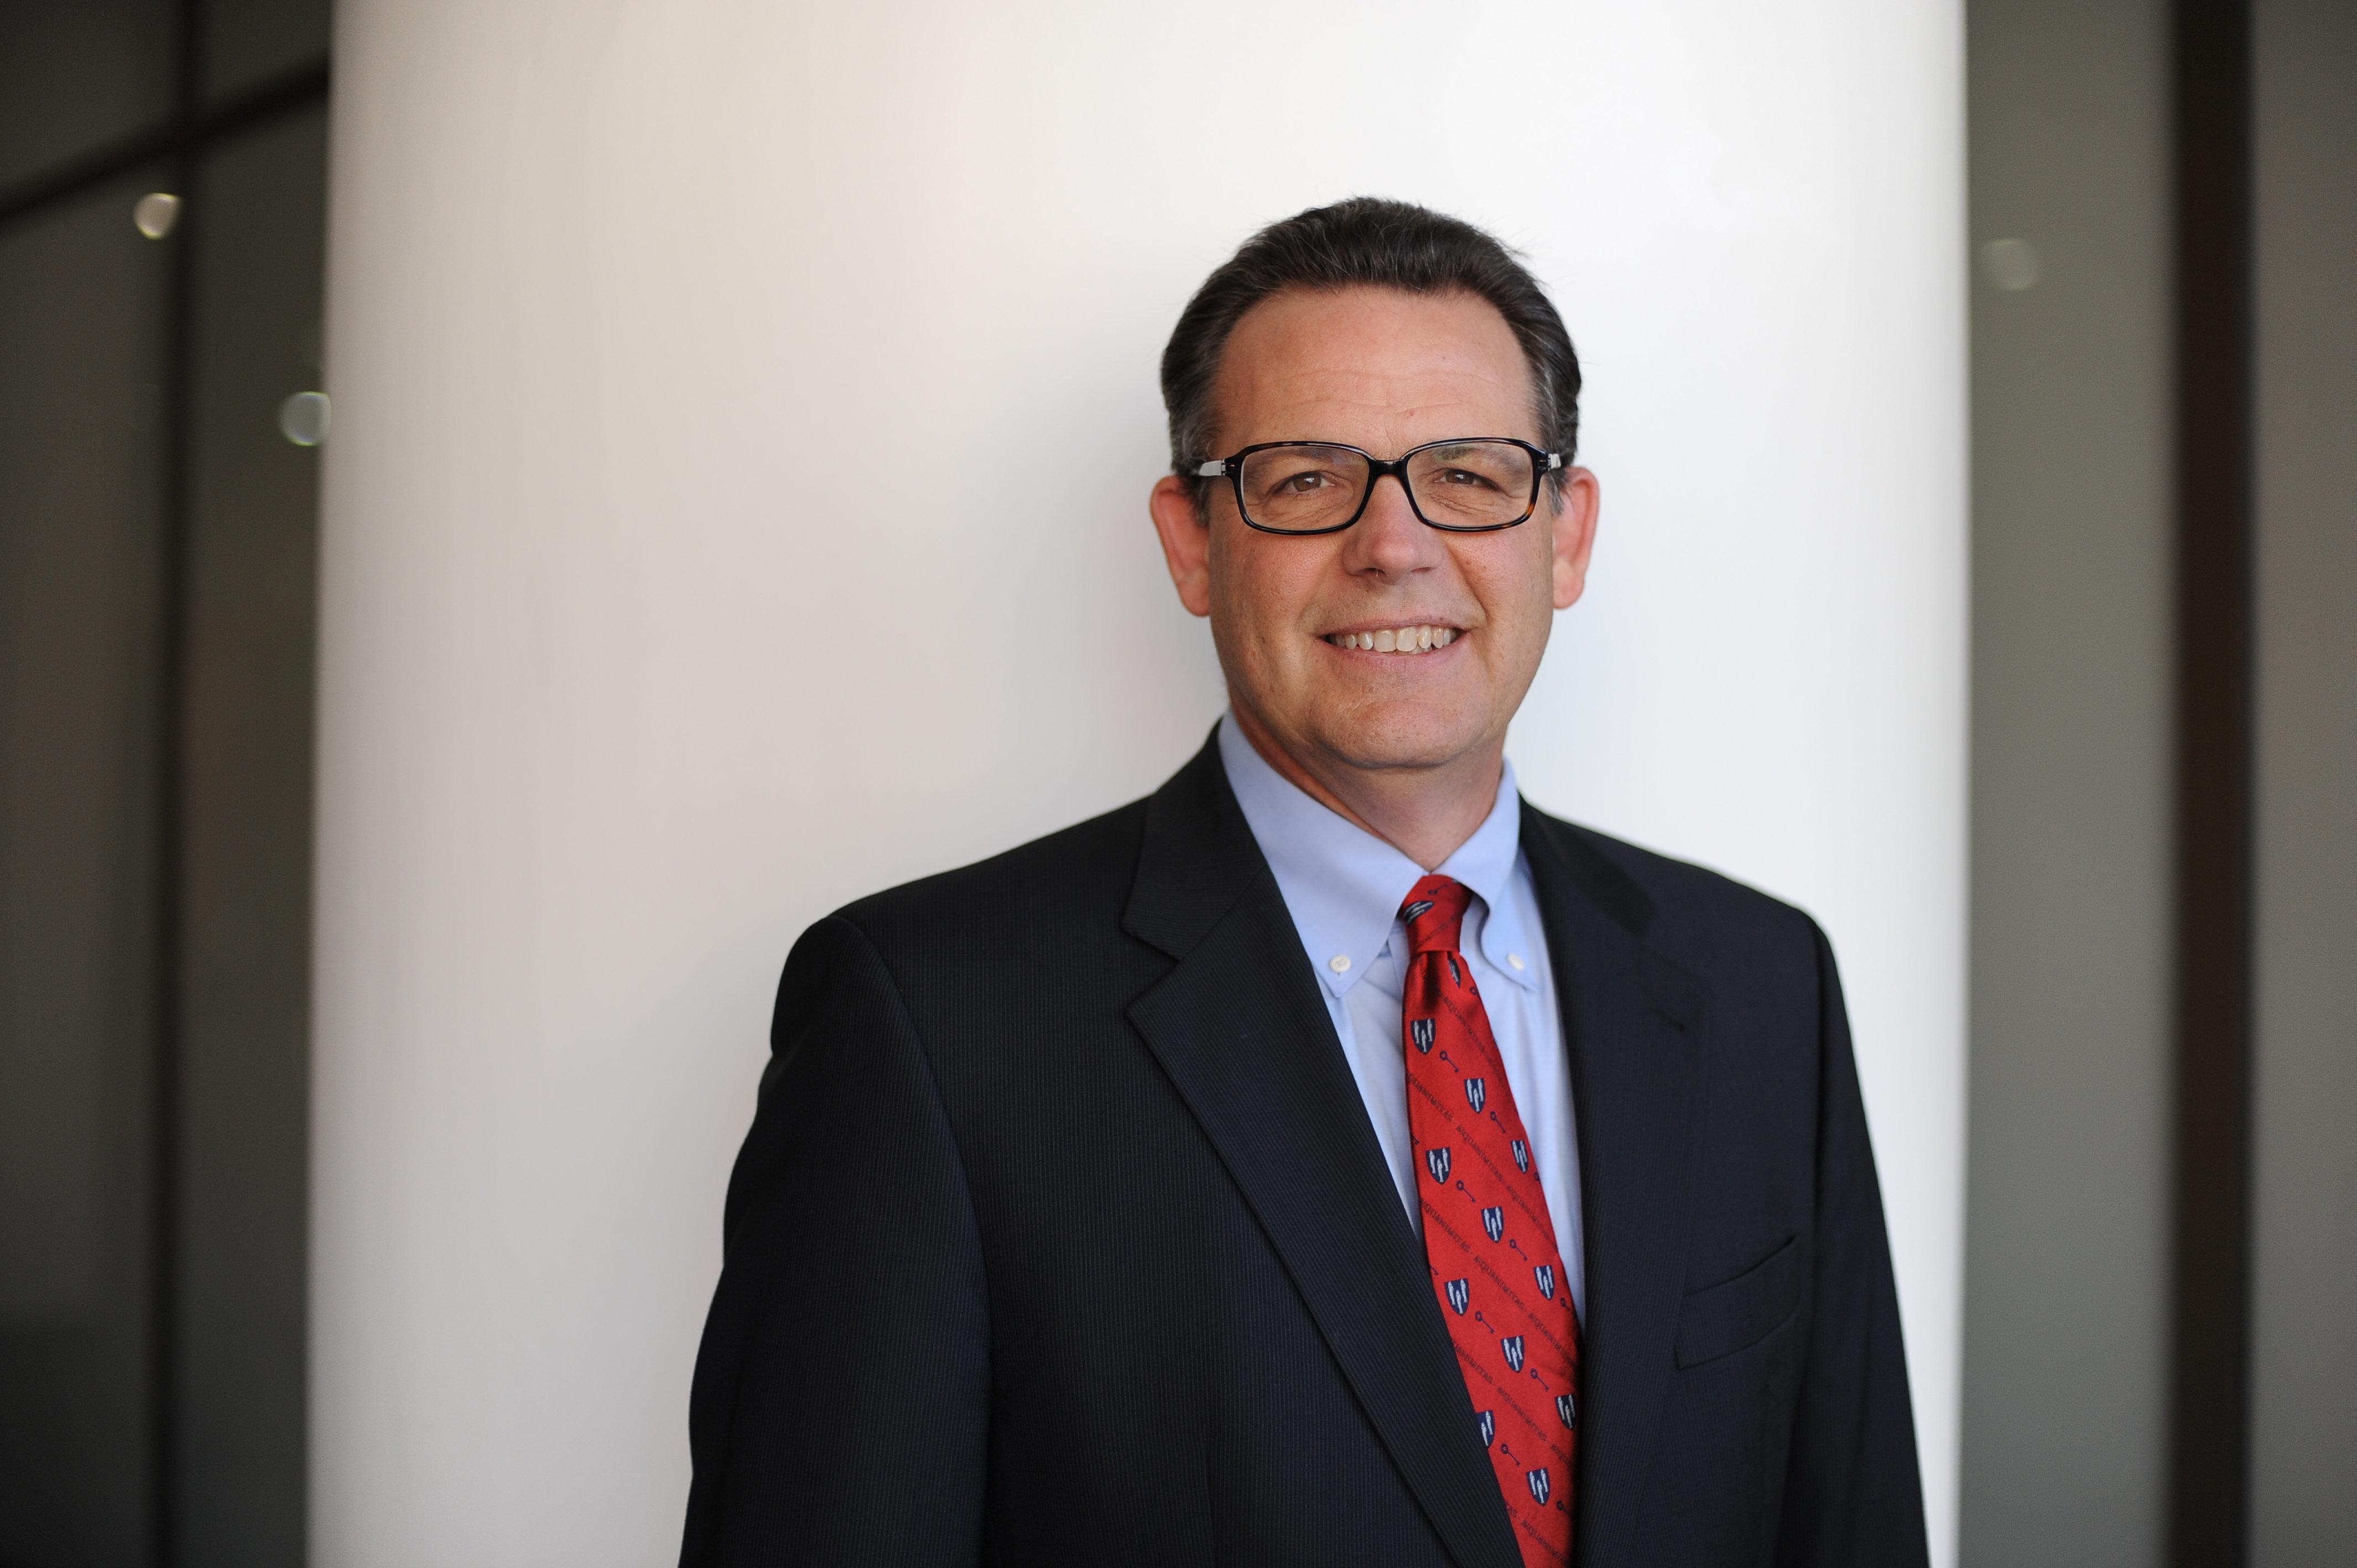 Mario Molina, CEO of Molina Healthcare.